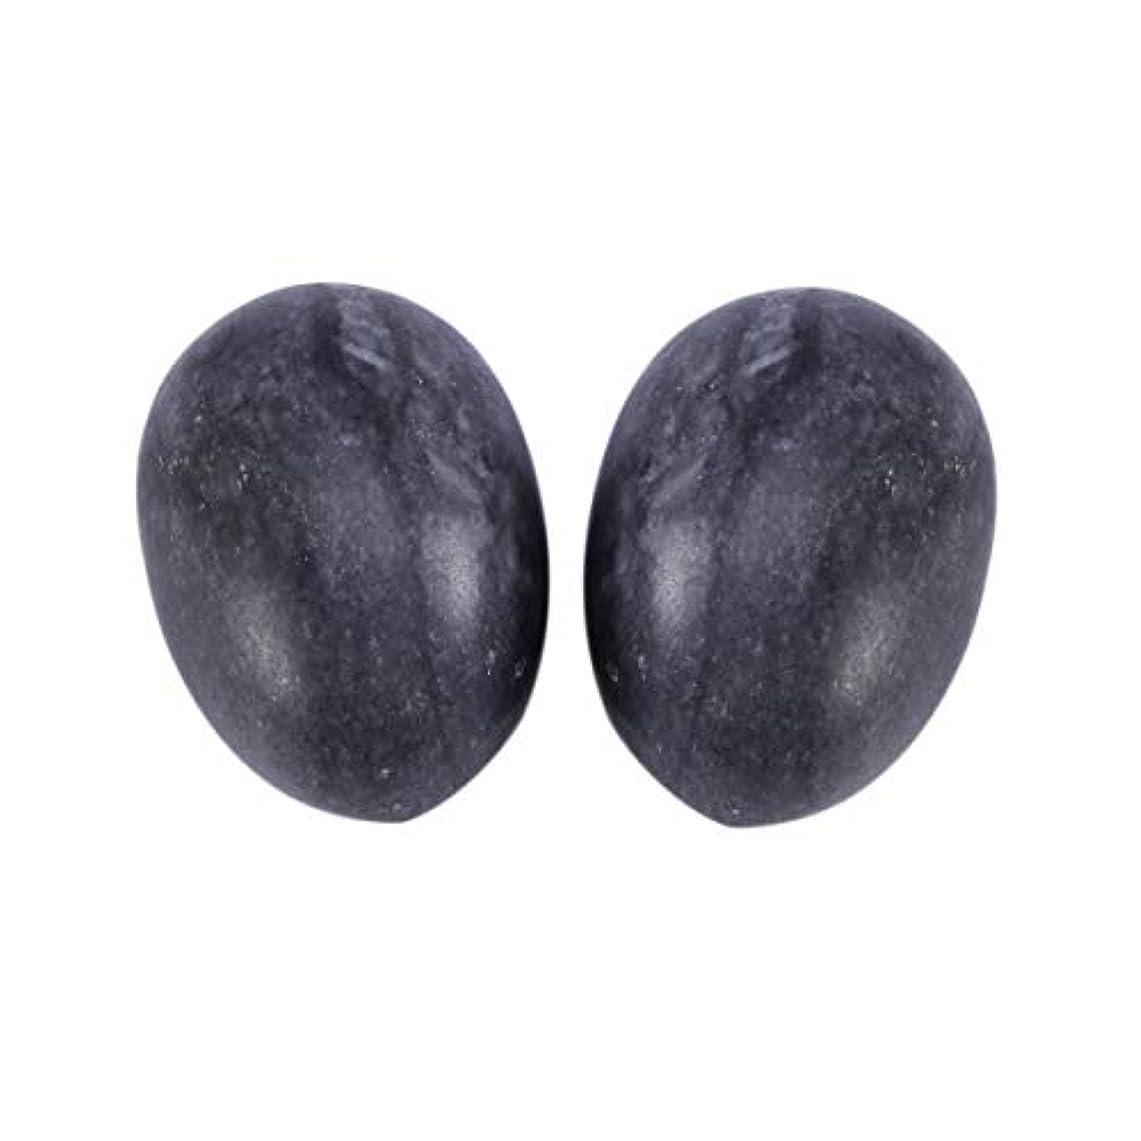 SUPVOX 6本ネフライトジェイドヨニエッグジェイドヨニマッサージストーンチャクラ骨盤筋肉癒しの卵マッサージケゲルエクササイズ(ブラックブルージェイドエッグ)